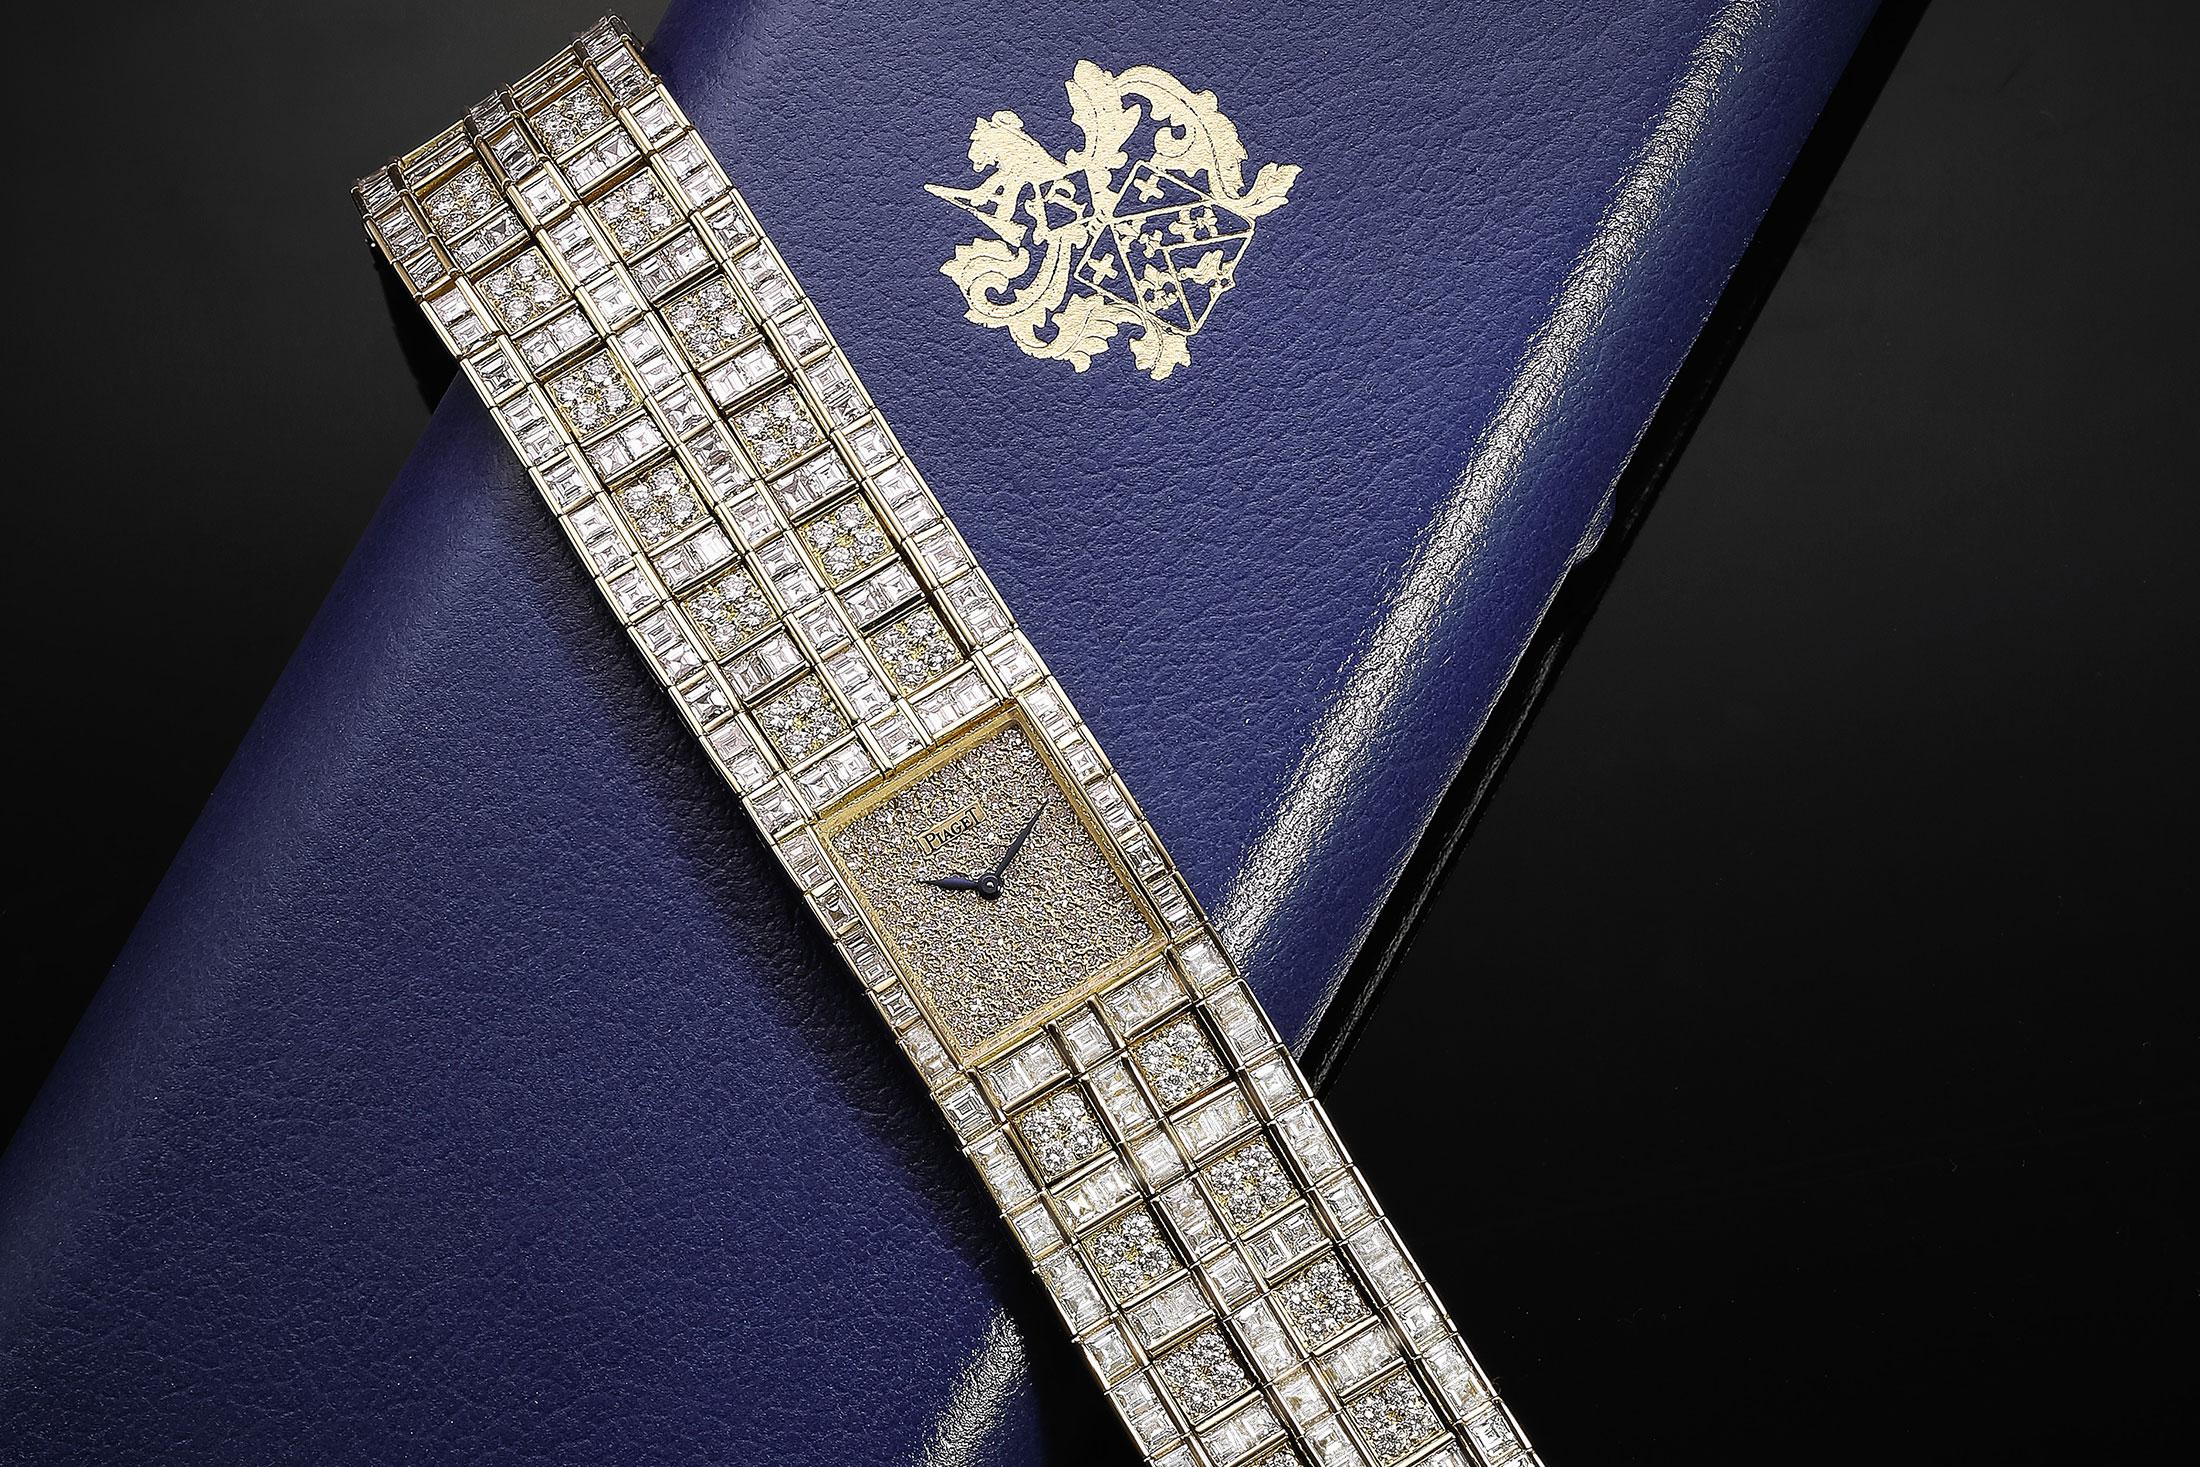 Piaget Bracelet Watch (Lot 58)